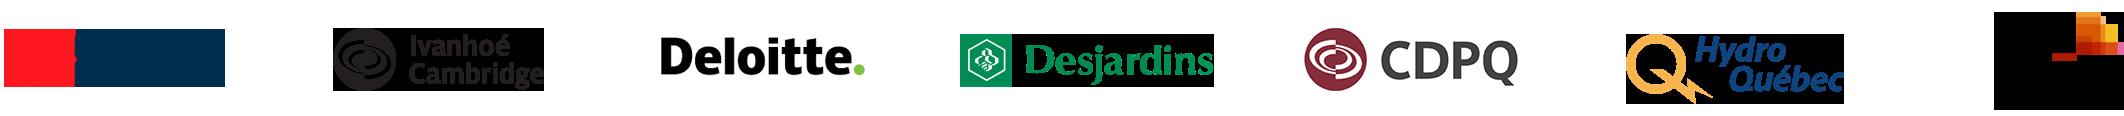 formations-logo